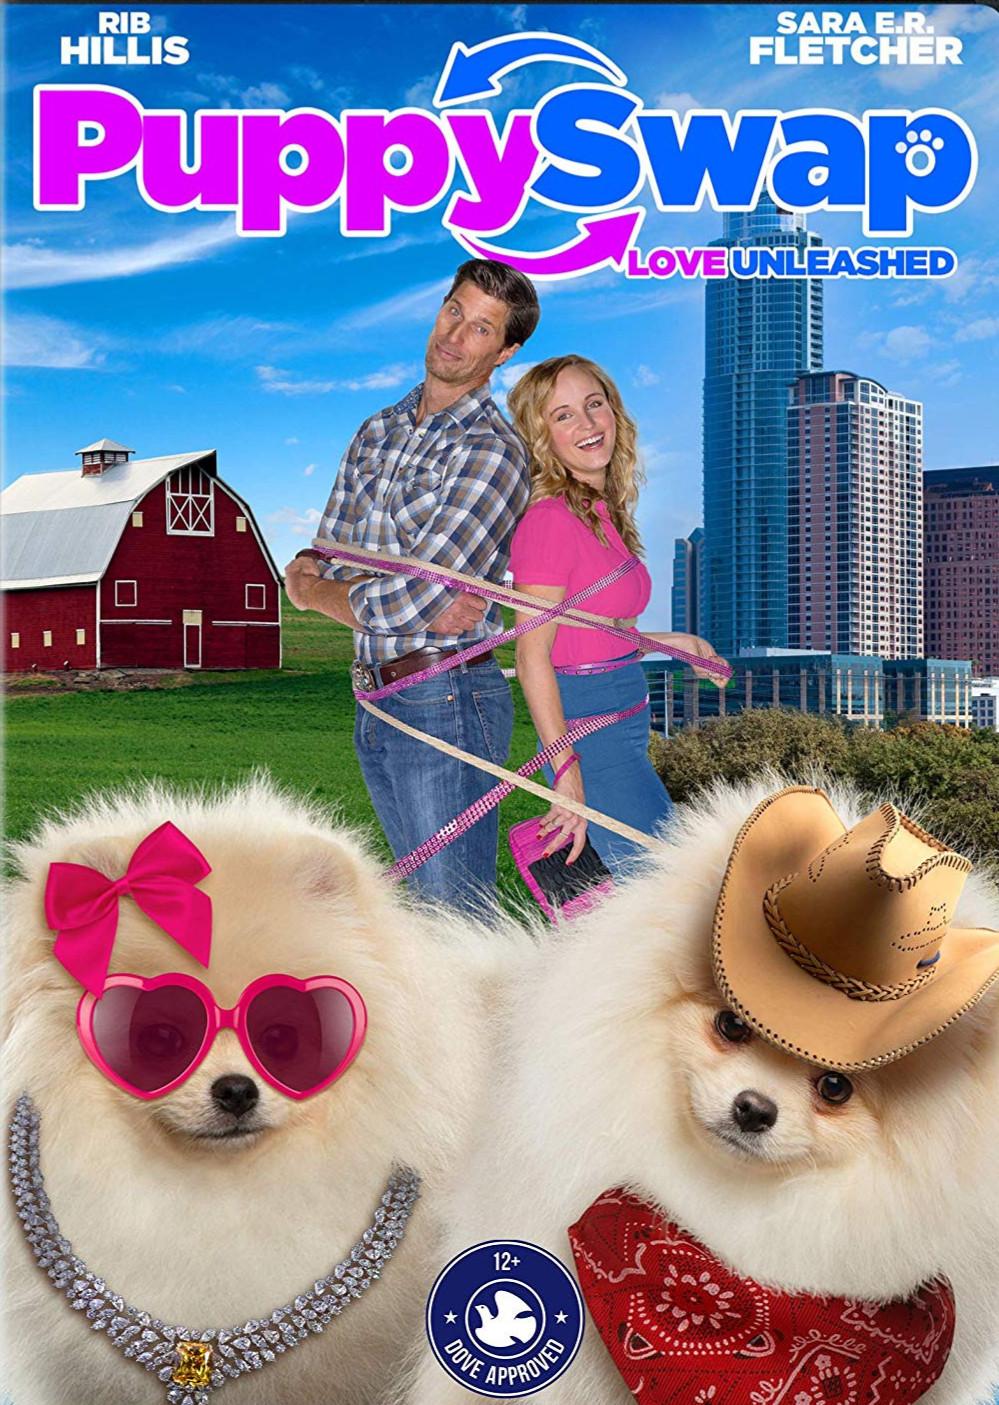 Šuniukų meilė (2019) / Puppy Swap Love Unleashed